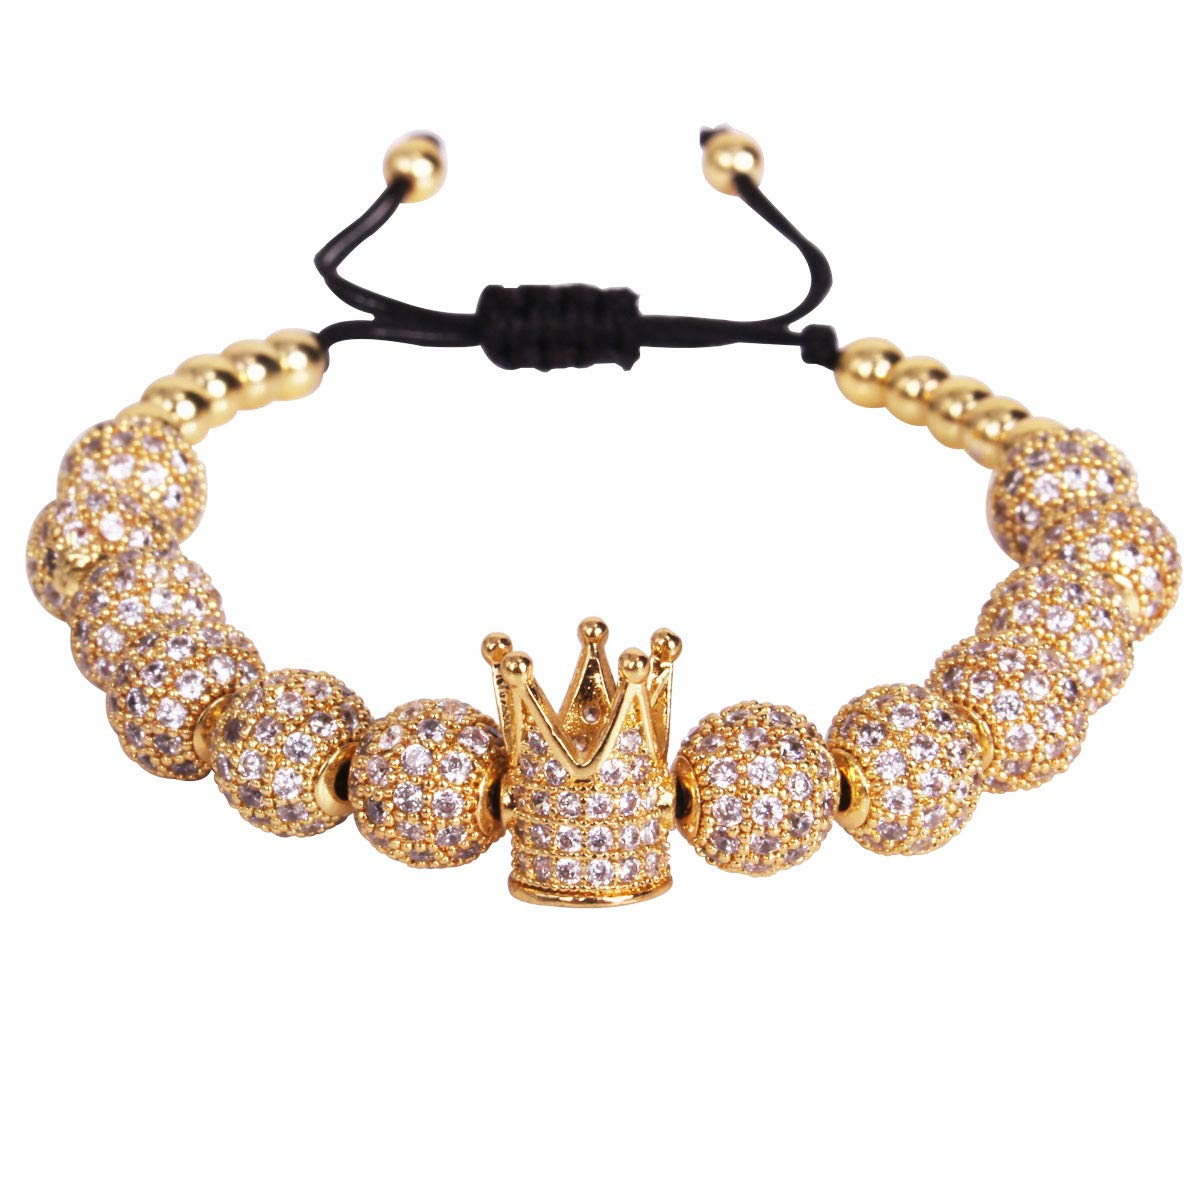 GVUSMIL 18kt Gold Plated Luxury CZ Imperial King Crown Copper Beads Charm Bracelets for Women Men